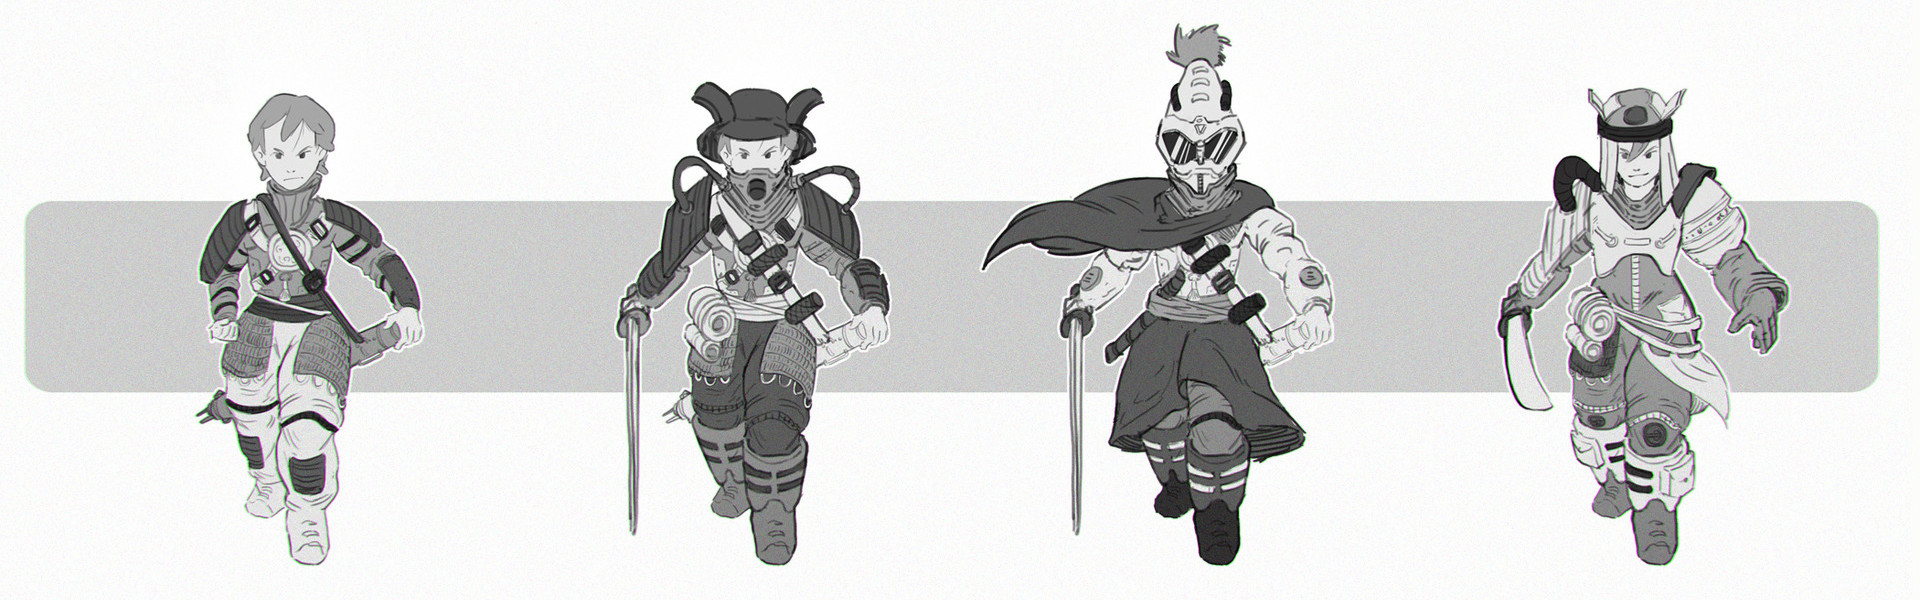 Adam fitzpatrick fitzfactor design samurai 2